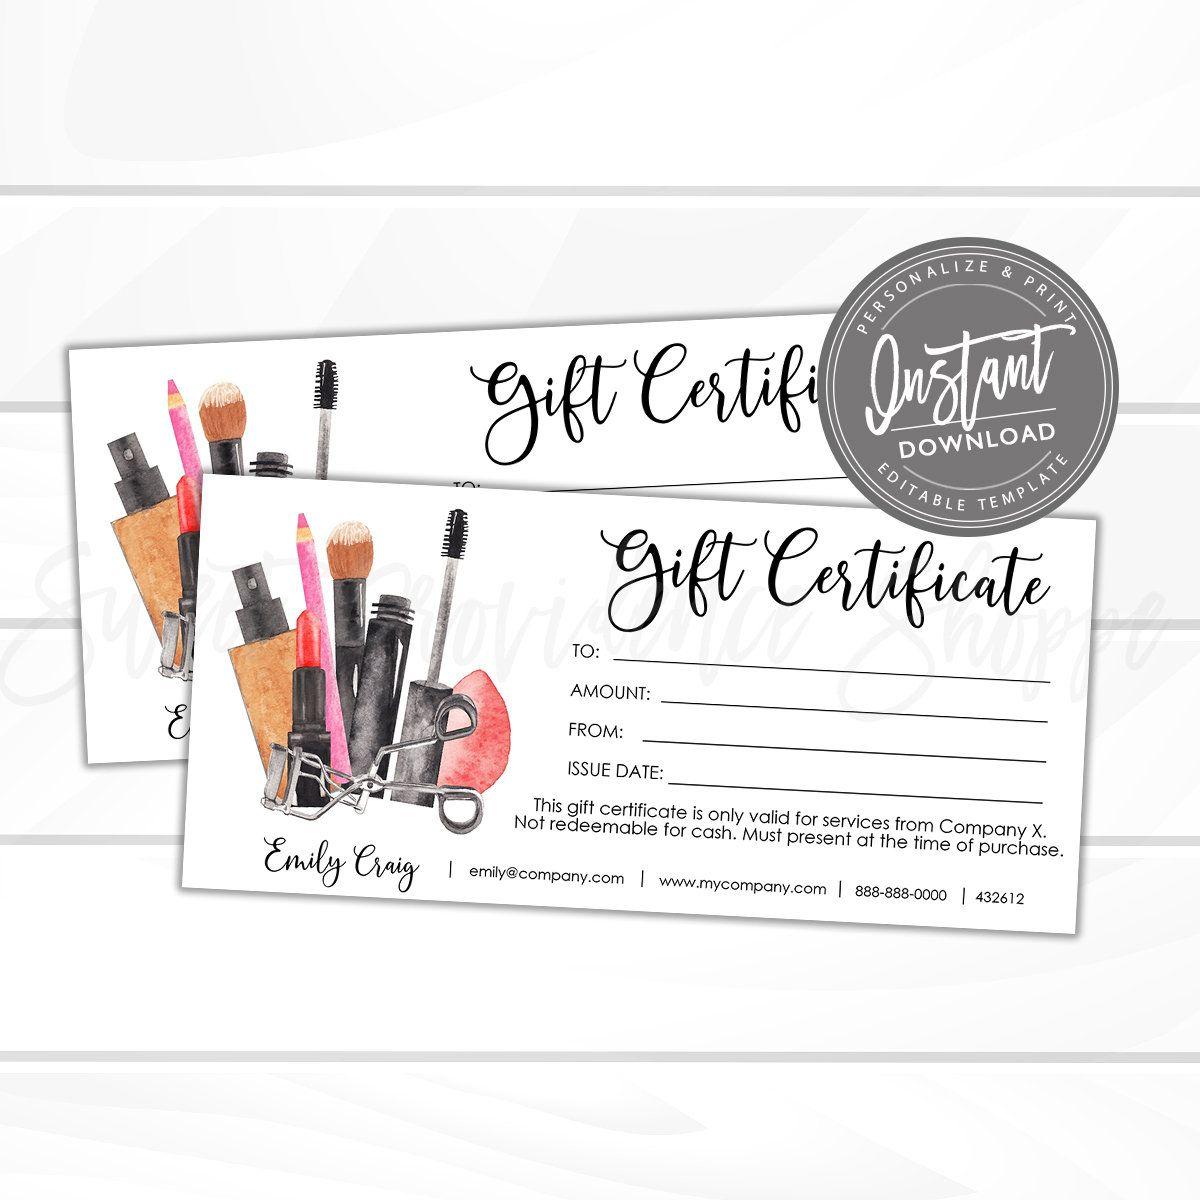 Editable Gift Certificate Printable Makeup Gift Card Diy Etsy Printable Gift Certificate Gift Certificates Diy Gift Card